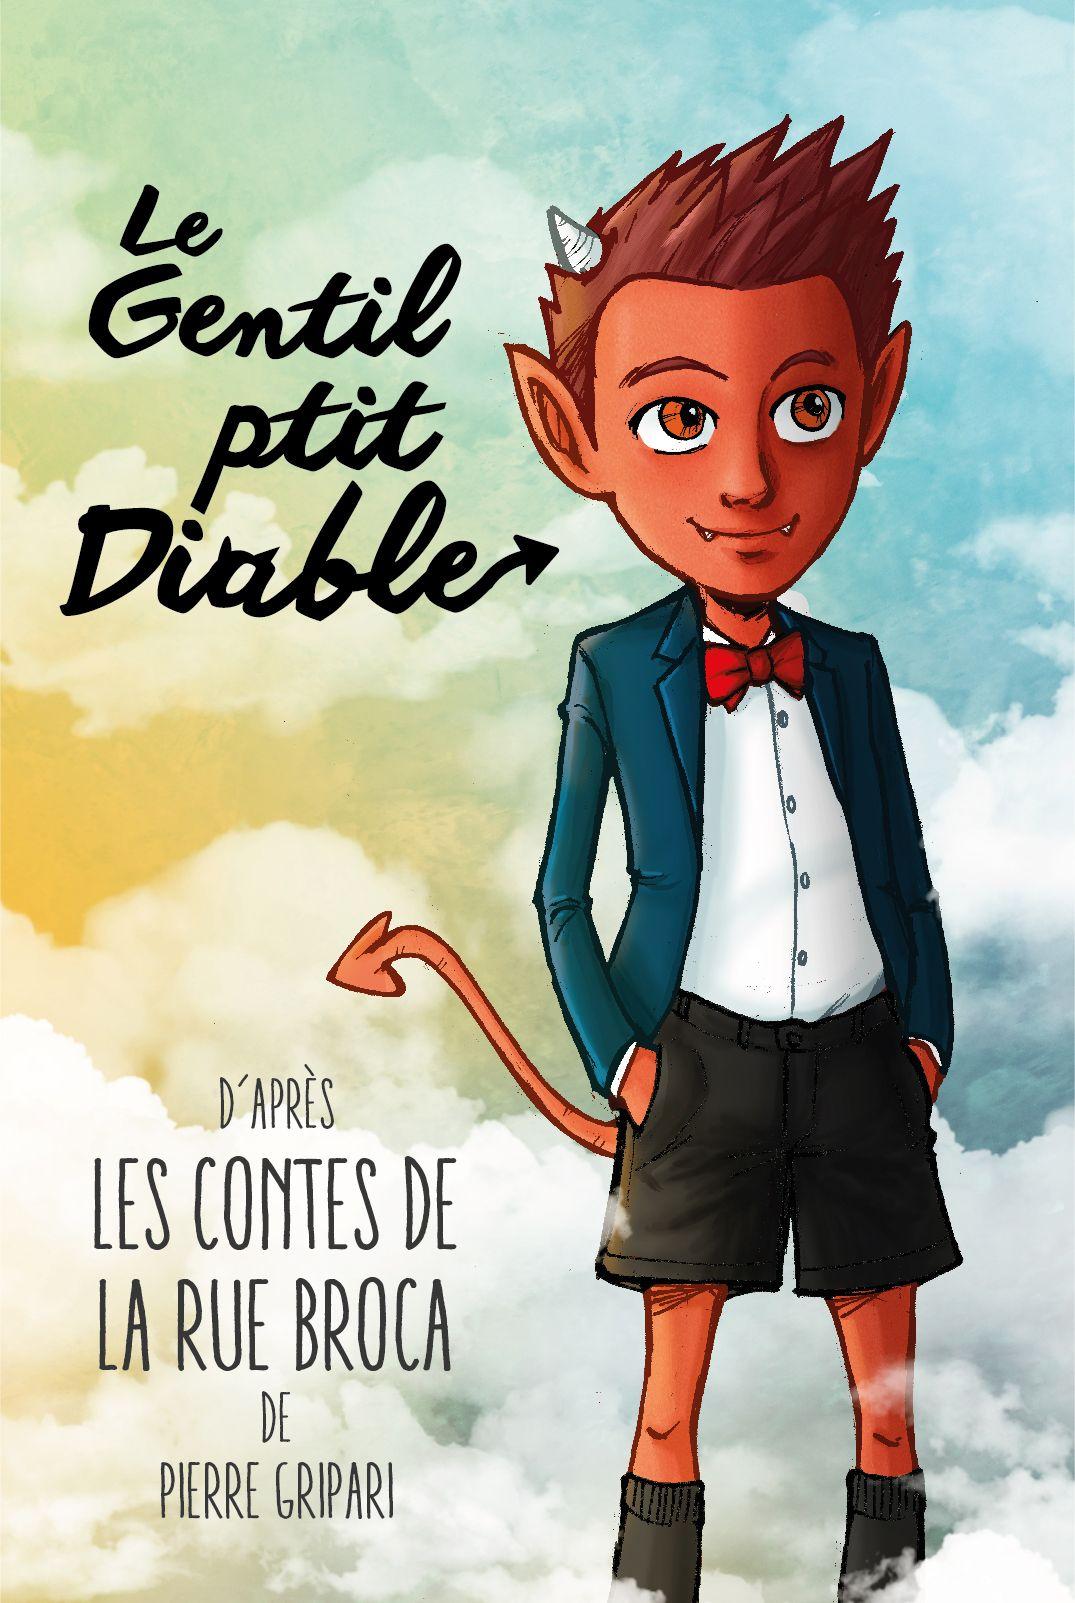 Le gentil petit diable les contes de la rue broca old - Les petit diable noel ...